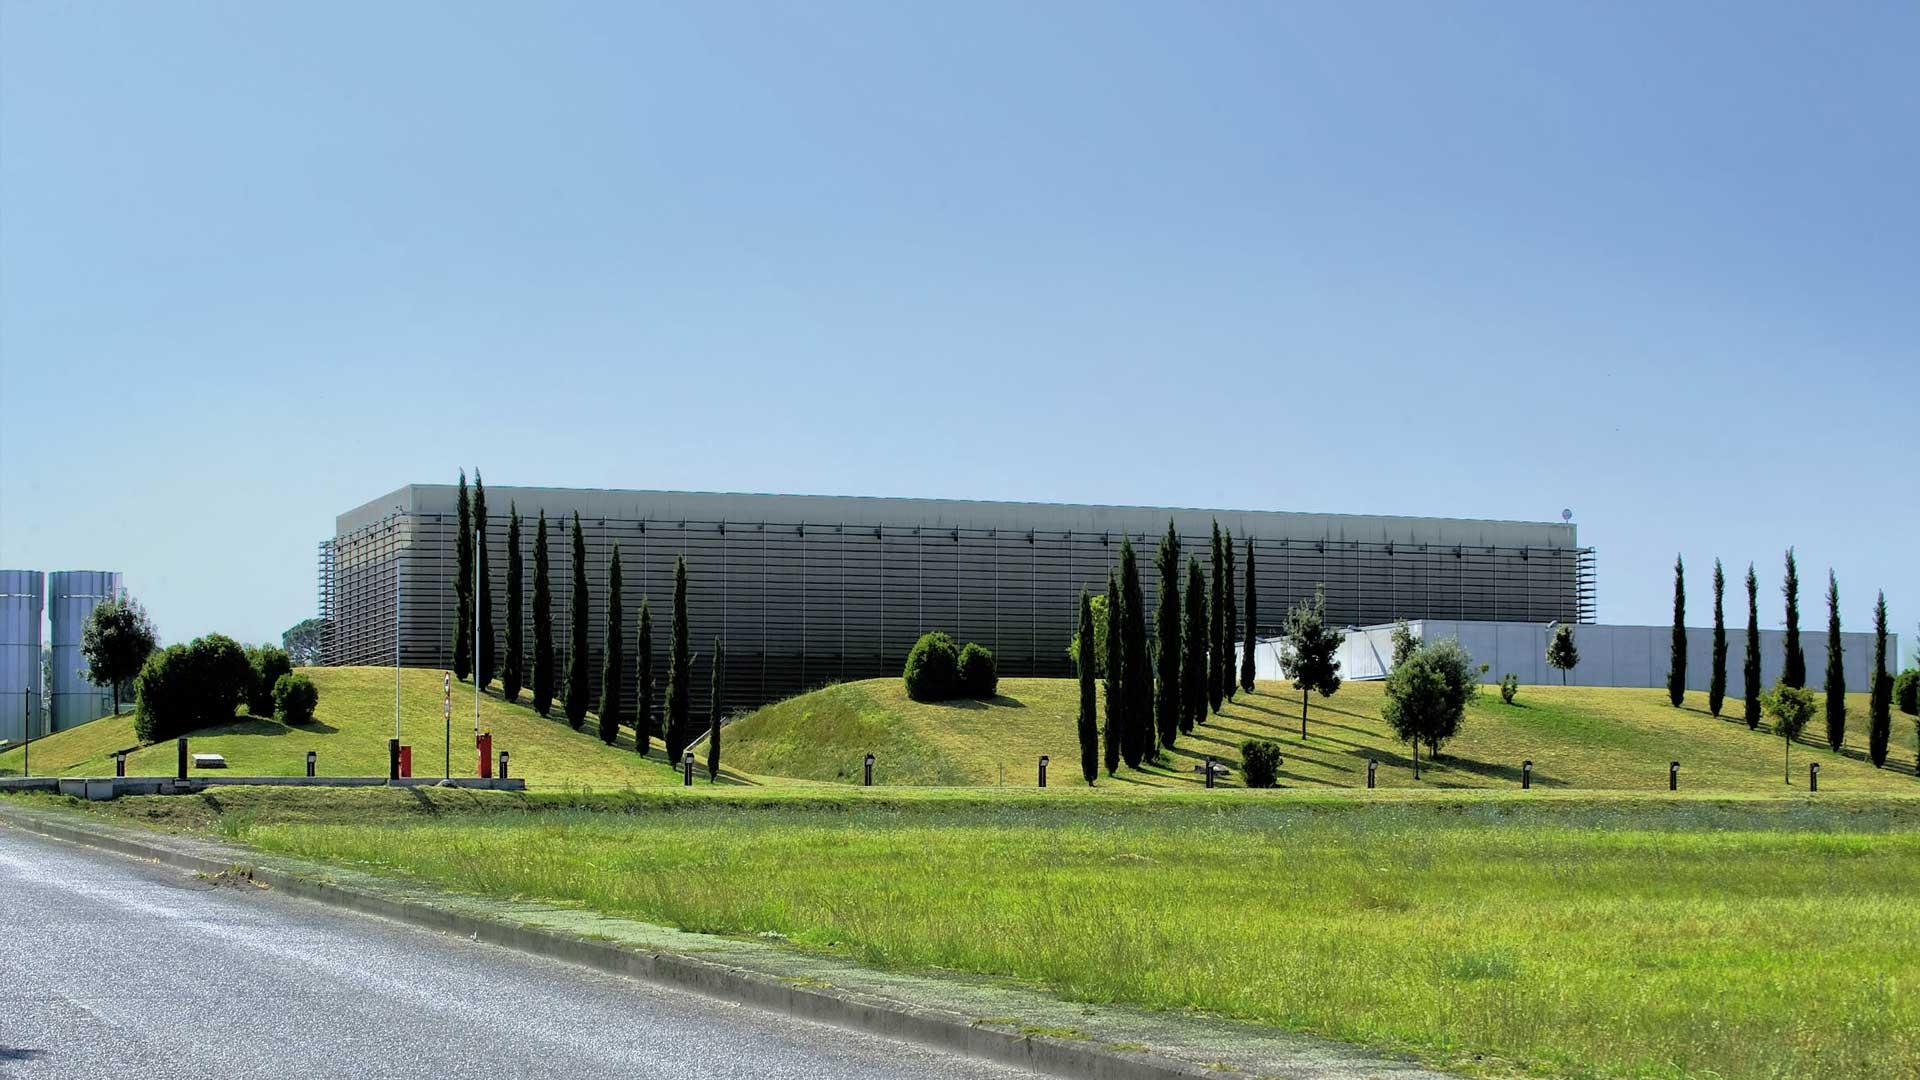 Miralduolo headquarters